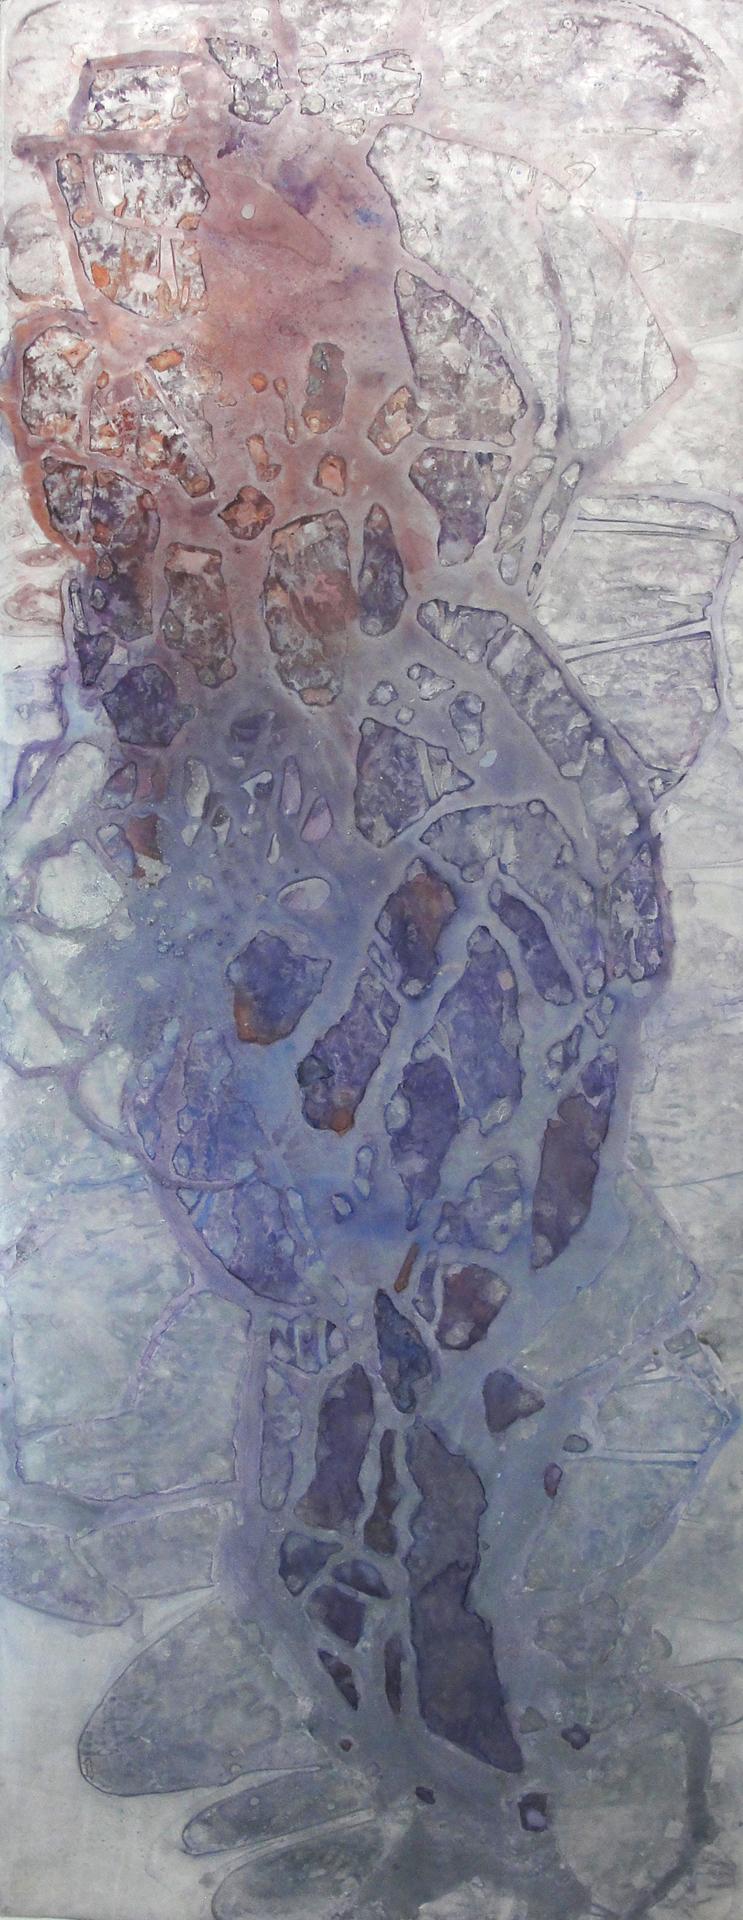 "Emerging,  2012  Duralar, enamel, ink, dry pigment. 53"" x 20"""